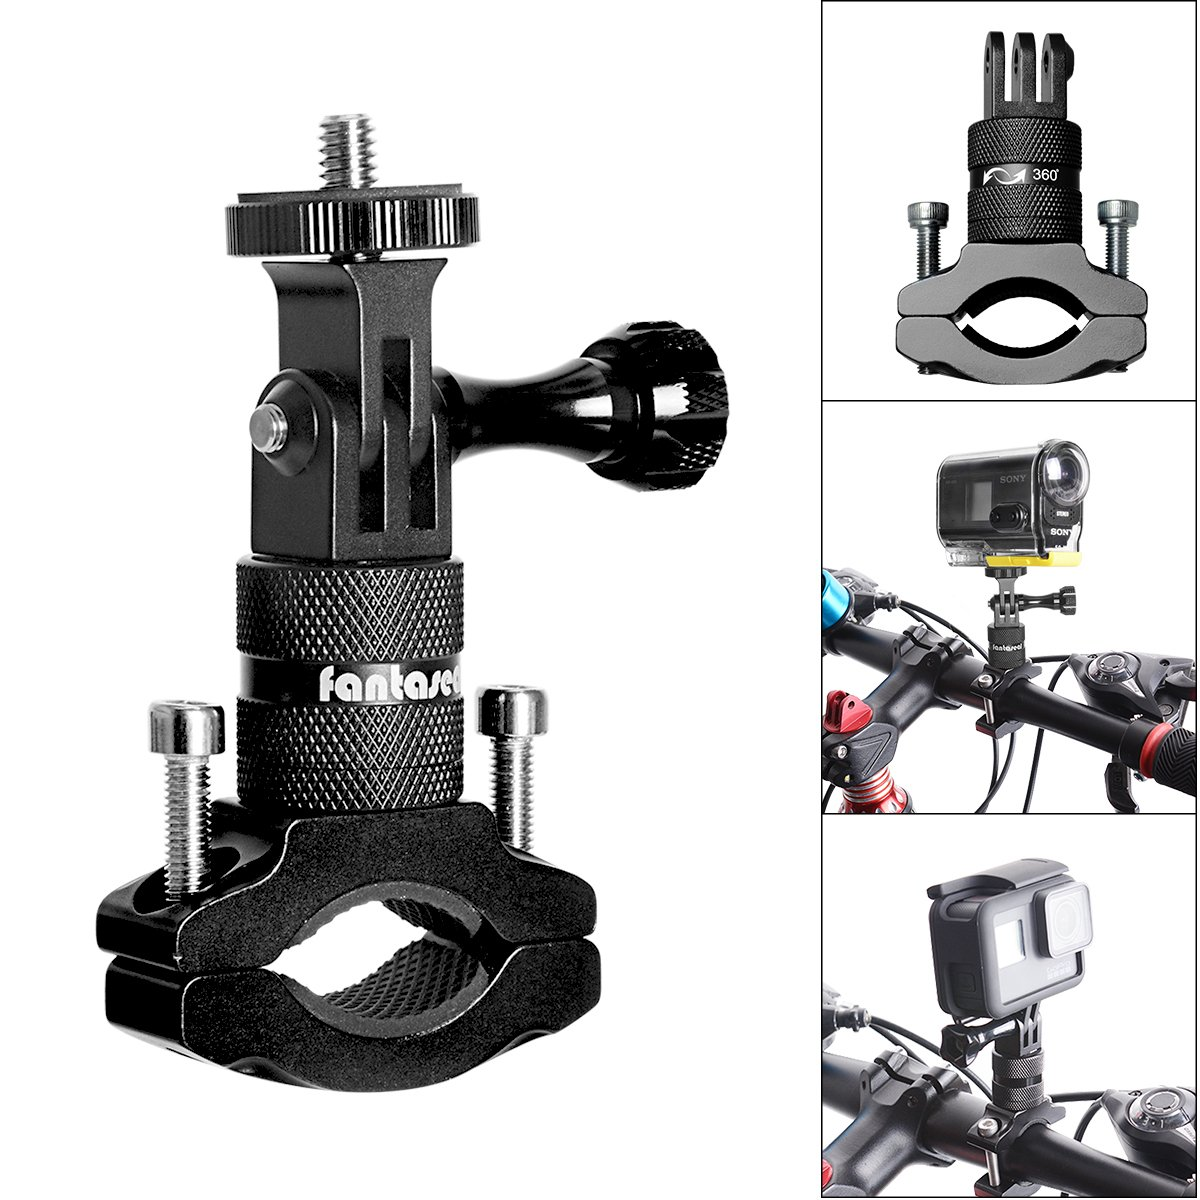 Action Kamera Bike Mount, Aluminium Lenker Adapter 360Grad drehbar Fahrrad Rack Mount für GoPro Hero 6/5/4/3+/3/2/Session Sony Action Cam und andere Sport Kamera Bike Halter Victool VBK-1703EU-T1